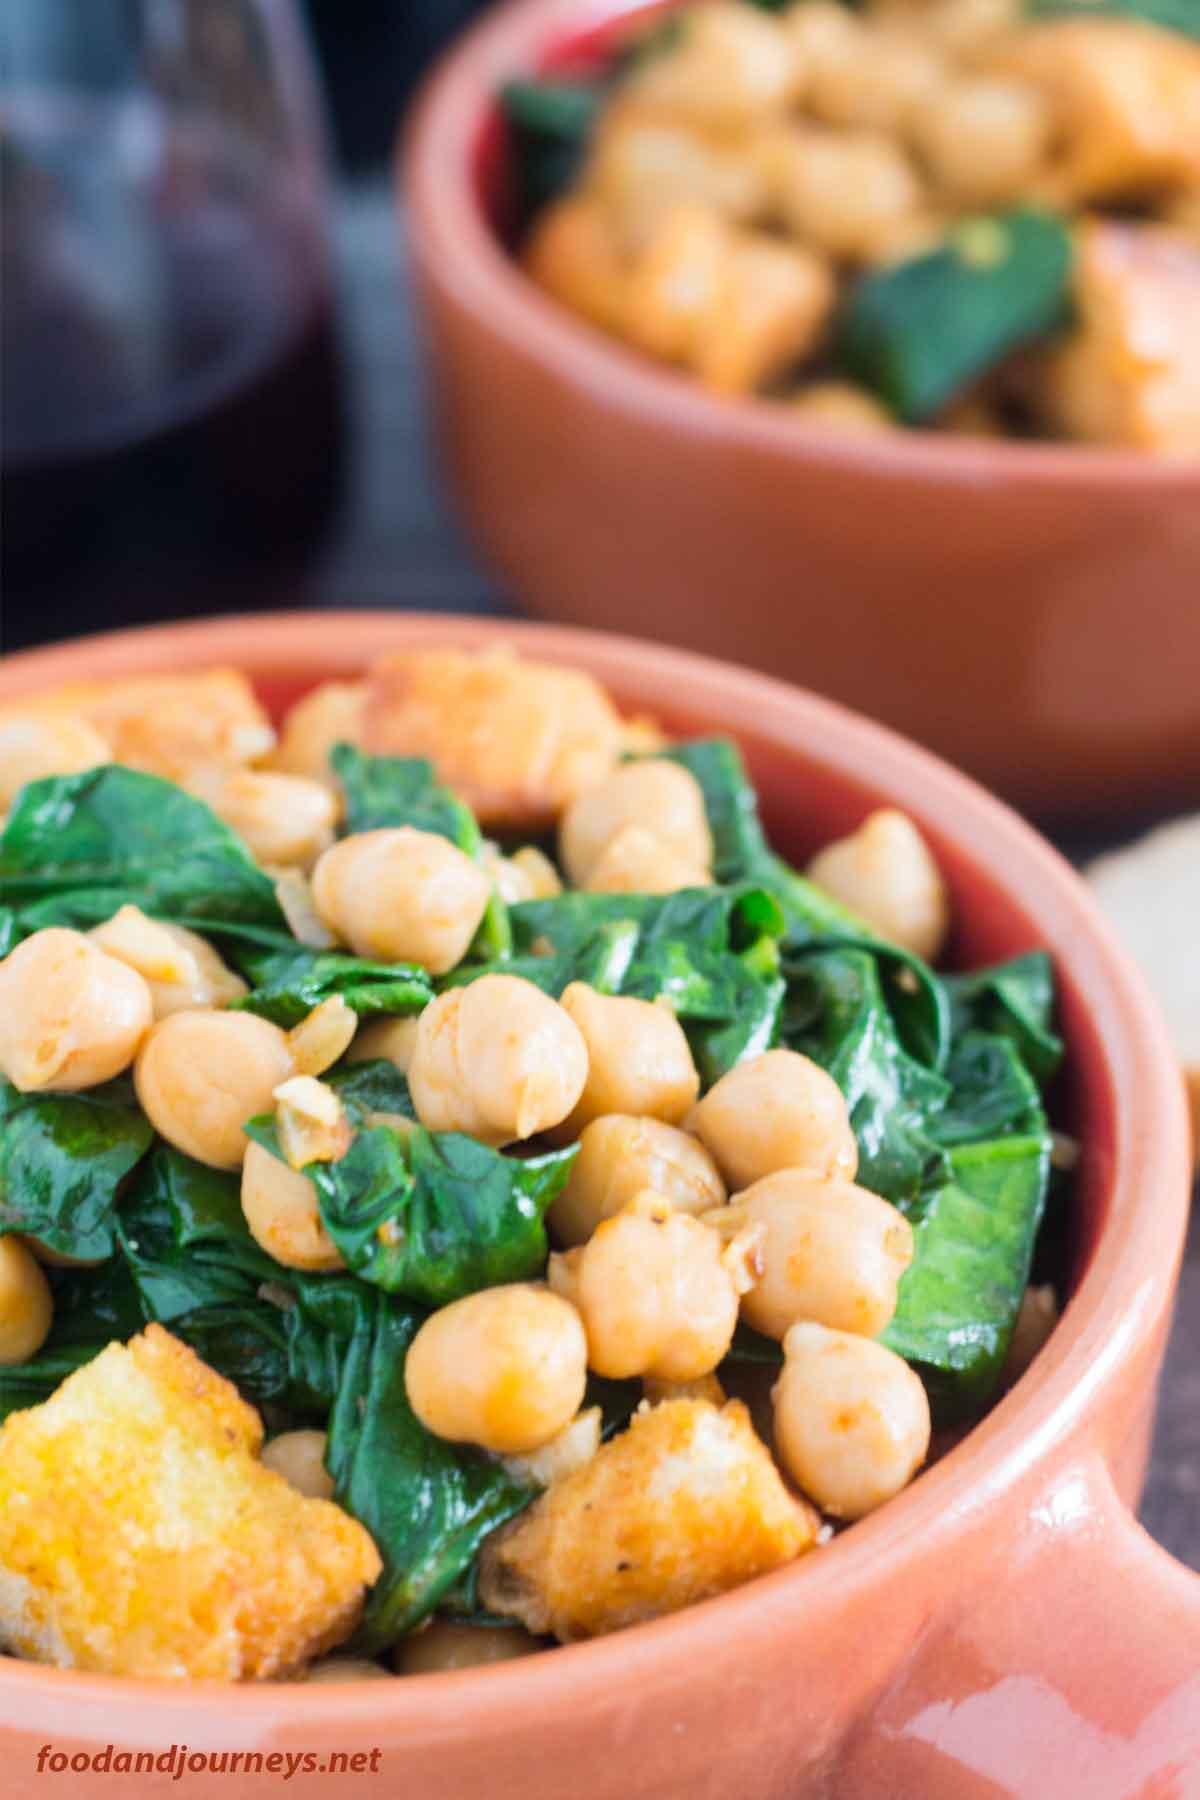 Closer shot of Spanish Spinach with Chickpeas (Espinacas con Garbanzos)|foodandjourneys.net